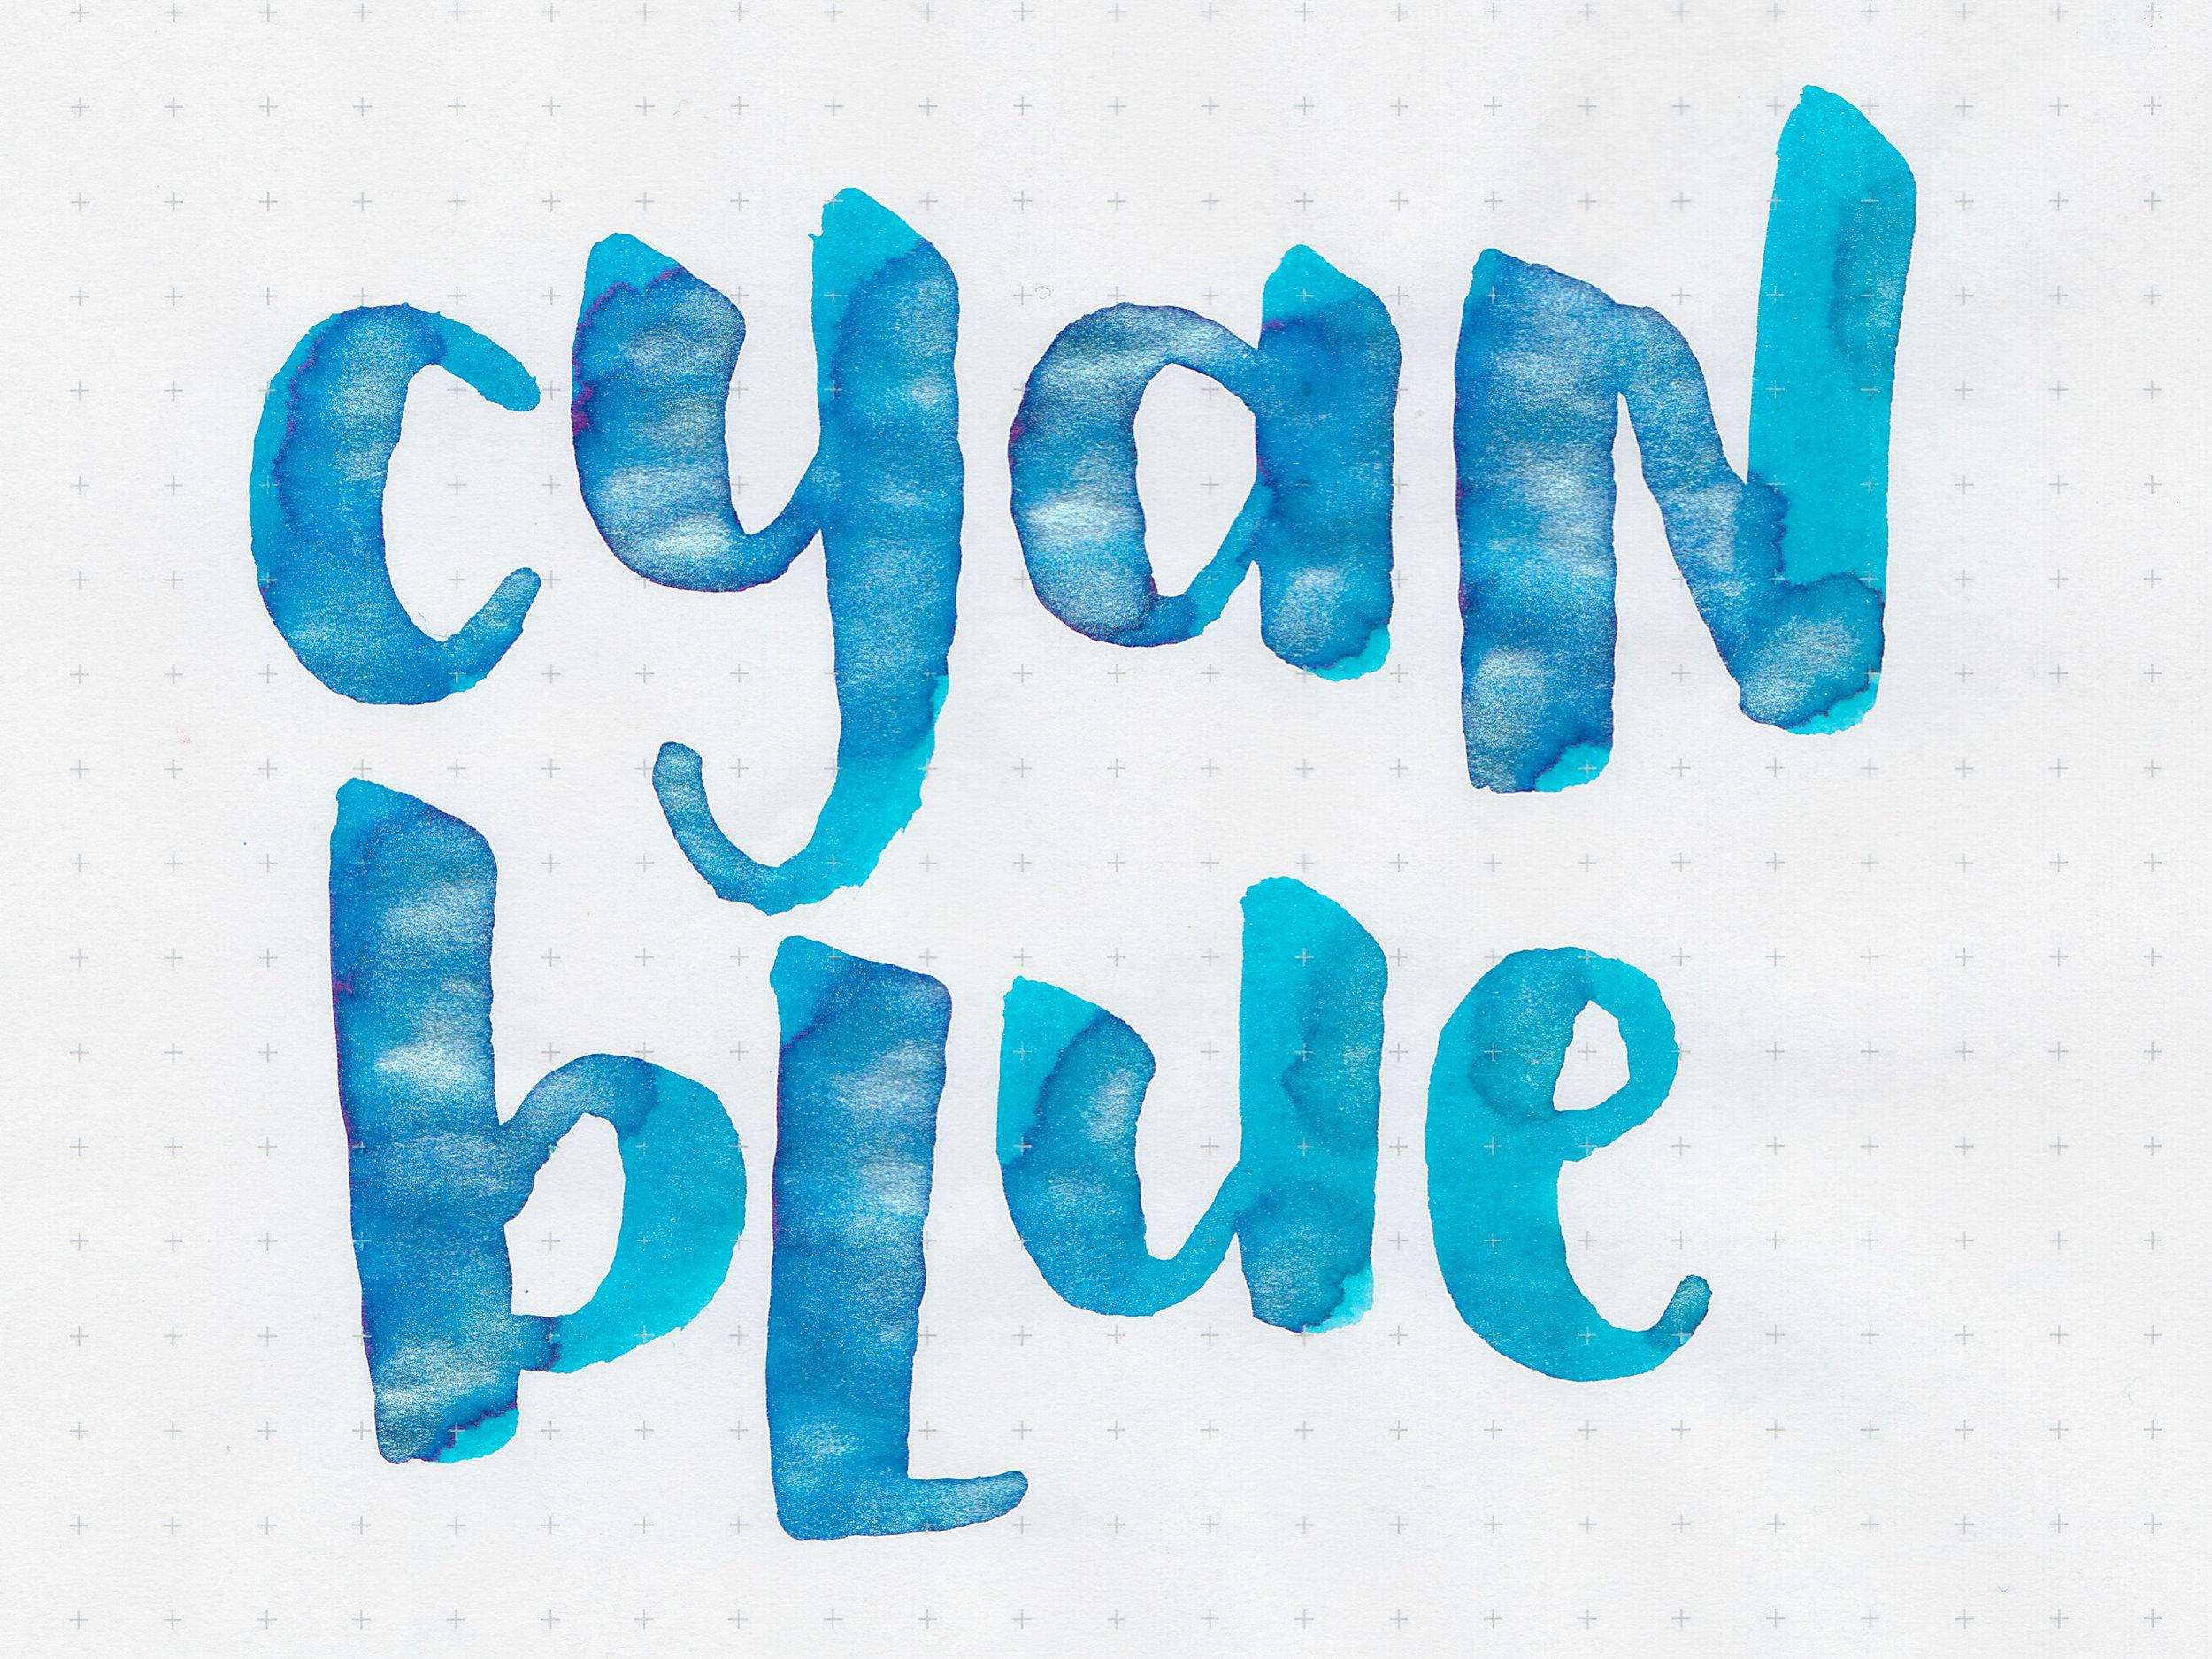 da-cyan-blue-5.jpg